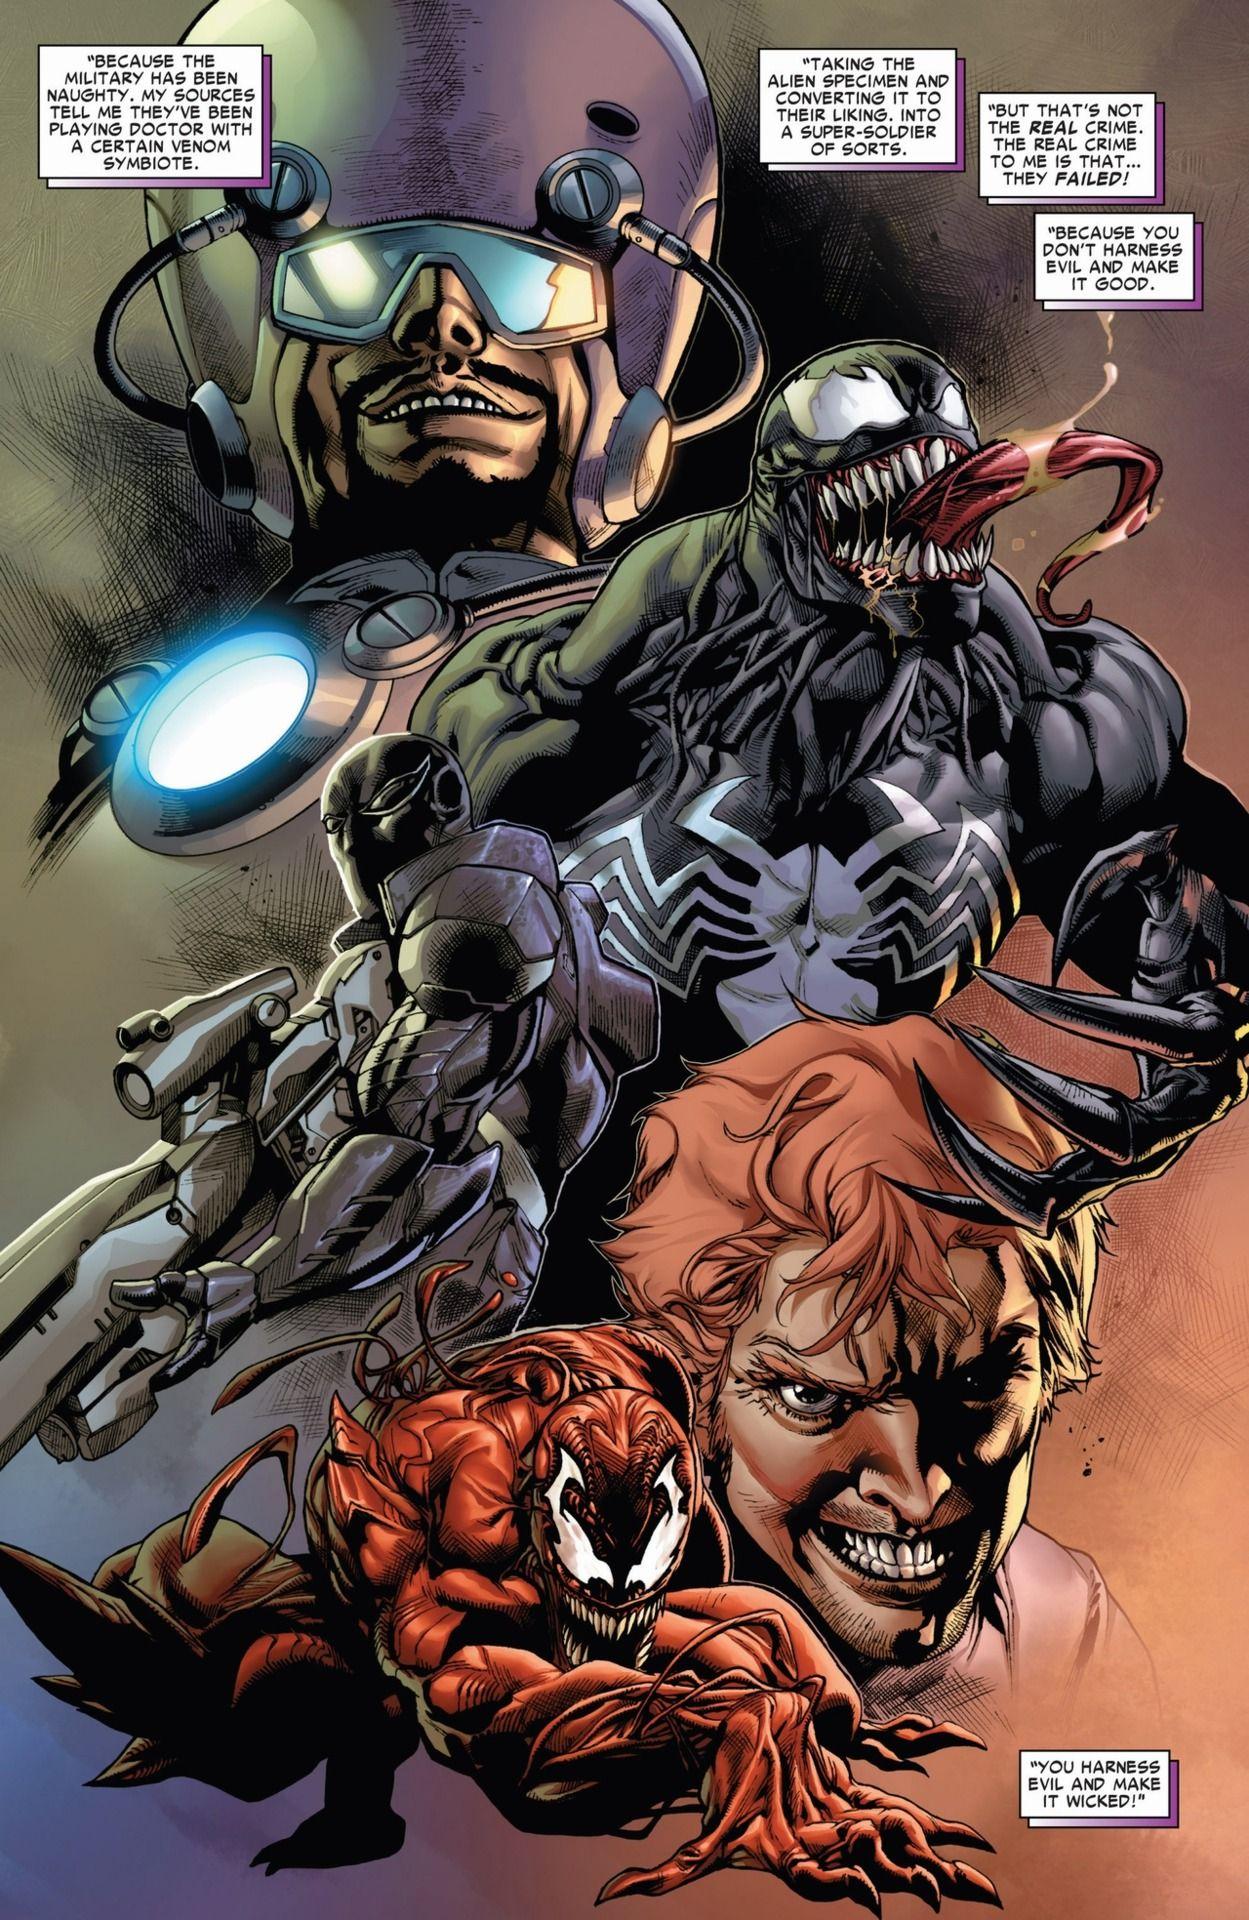 Venom screenshots, images and pictures - Comic Vine ...